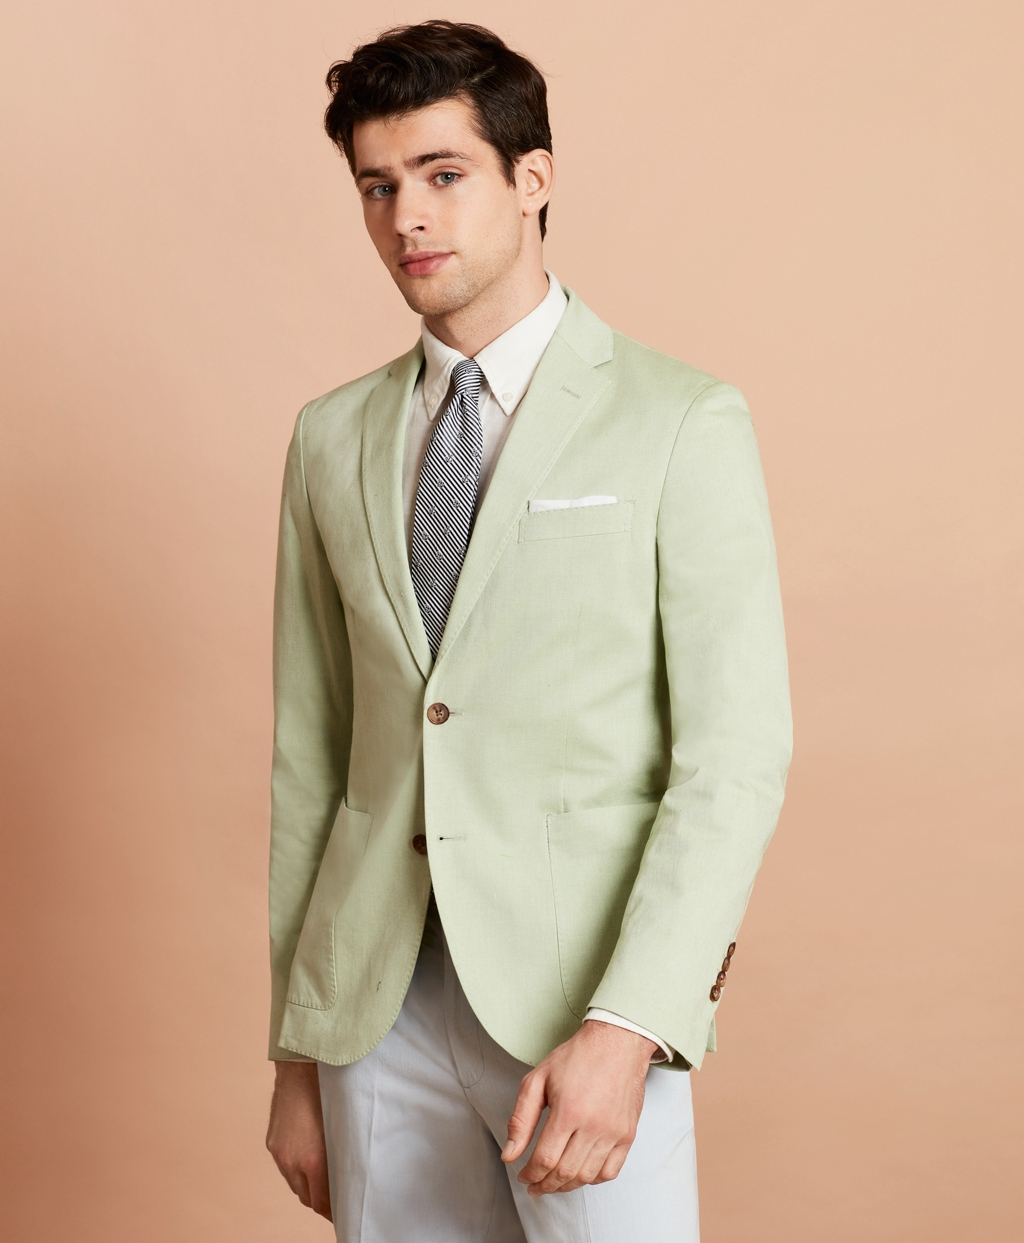 1960s Mens Suits | 70s Mens Disco Suits Brooks Brothers Mens Stretch-Cotton Sport Coat $198.00 AT vintagedancer.com